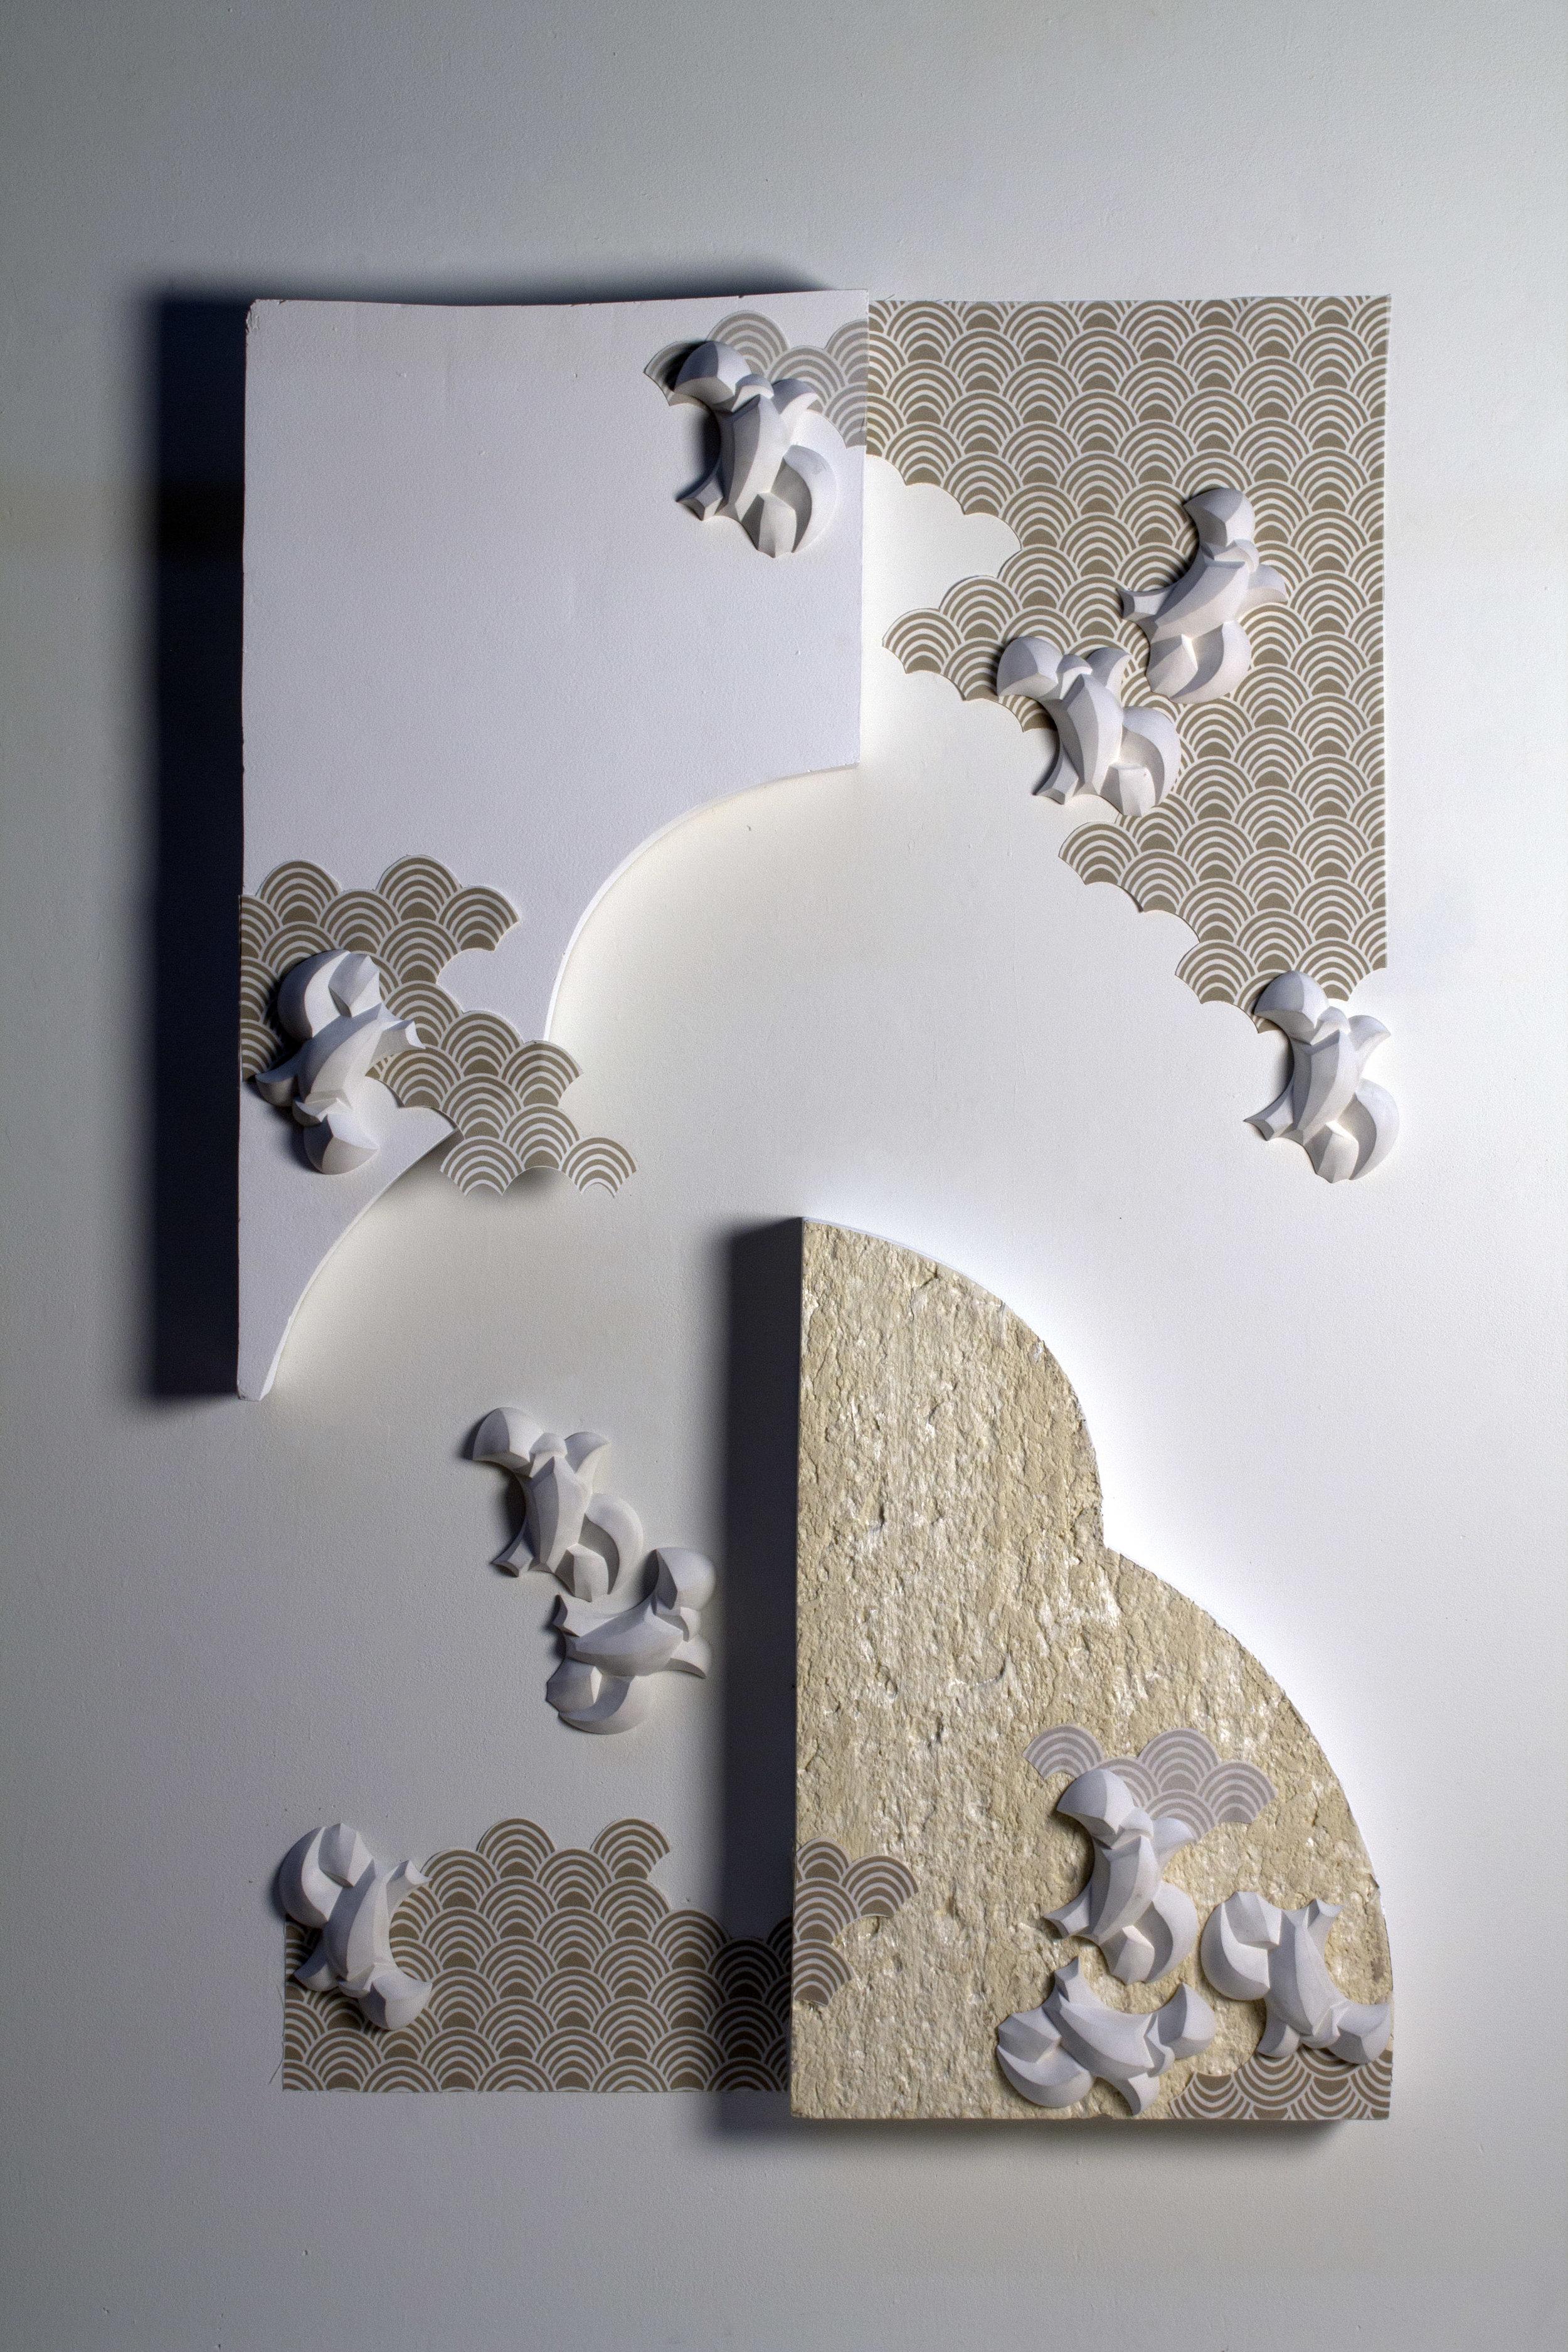 2016  Foam, slip cast low-fire porcelain, fabric